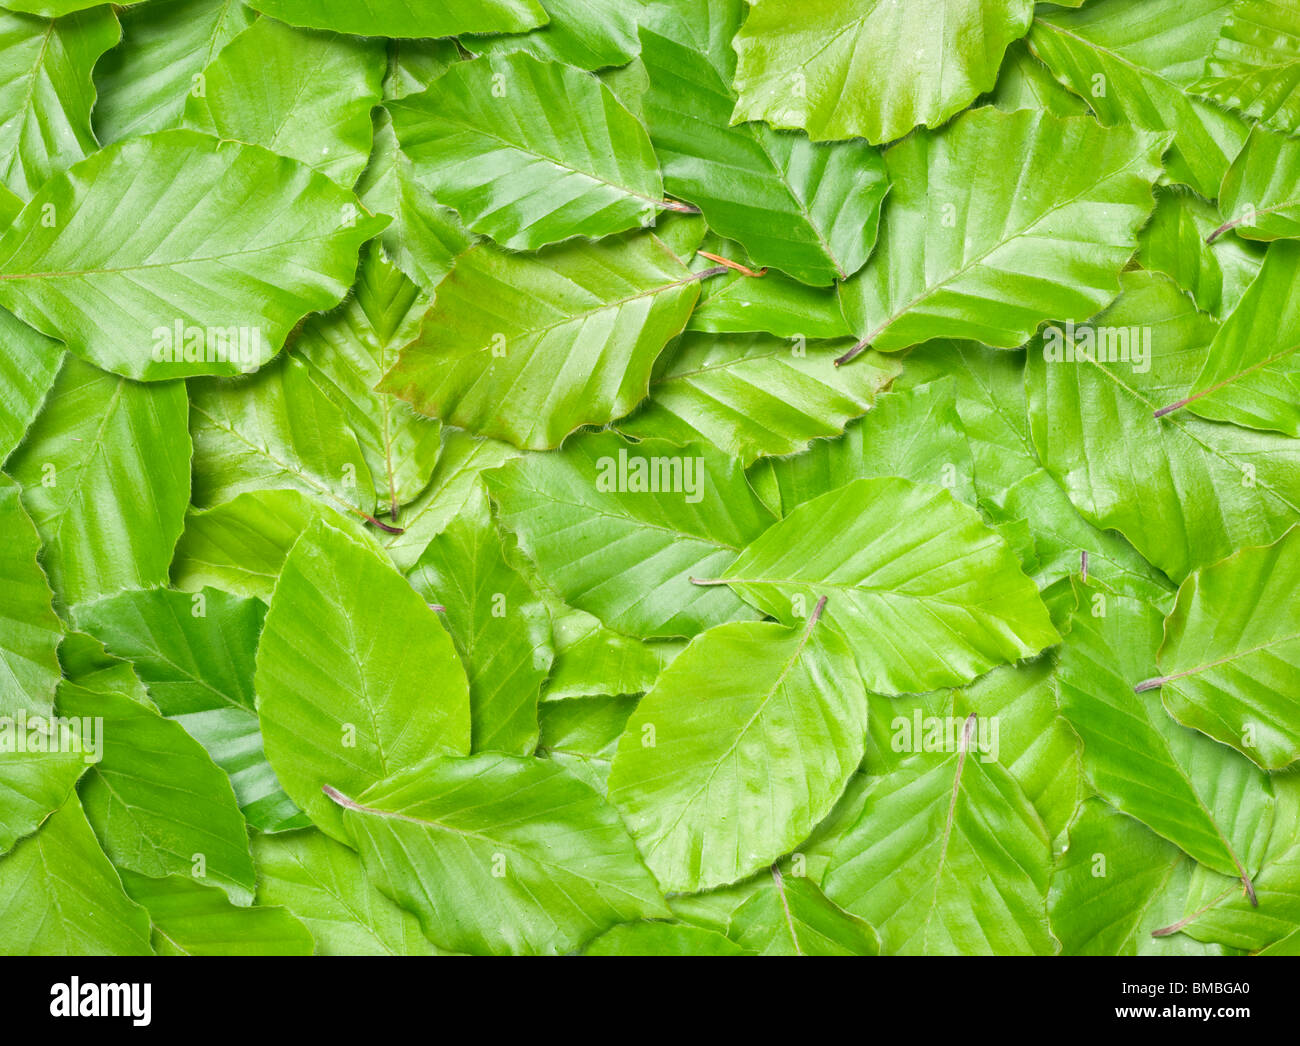 Beech leaves, Fagus sylvatica. - Stock Image